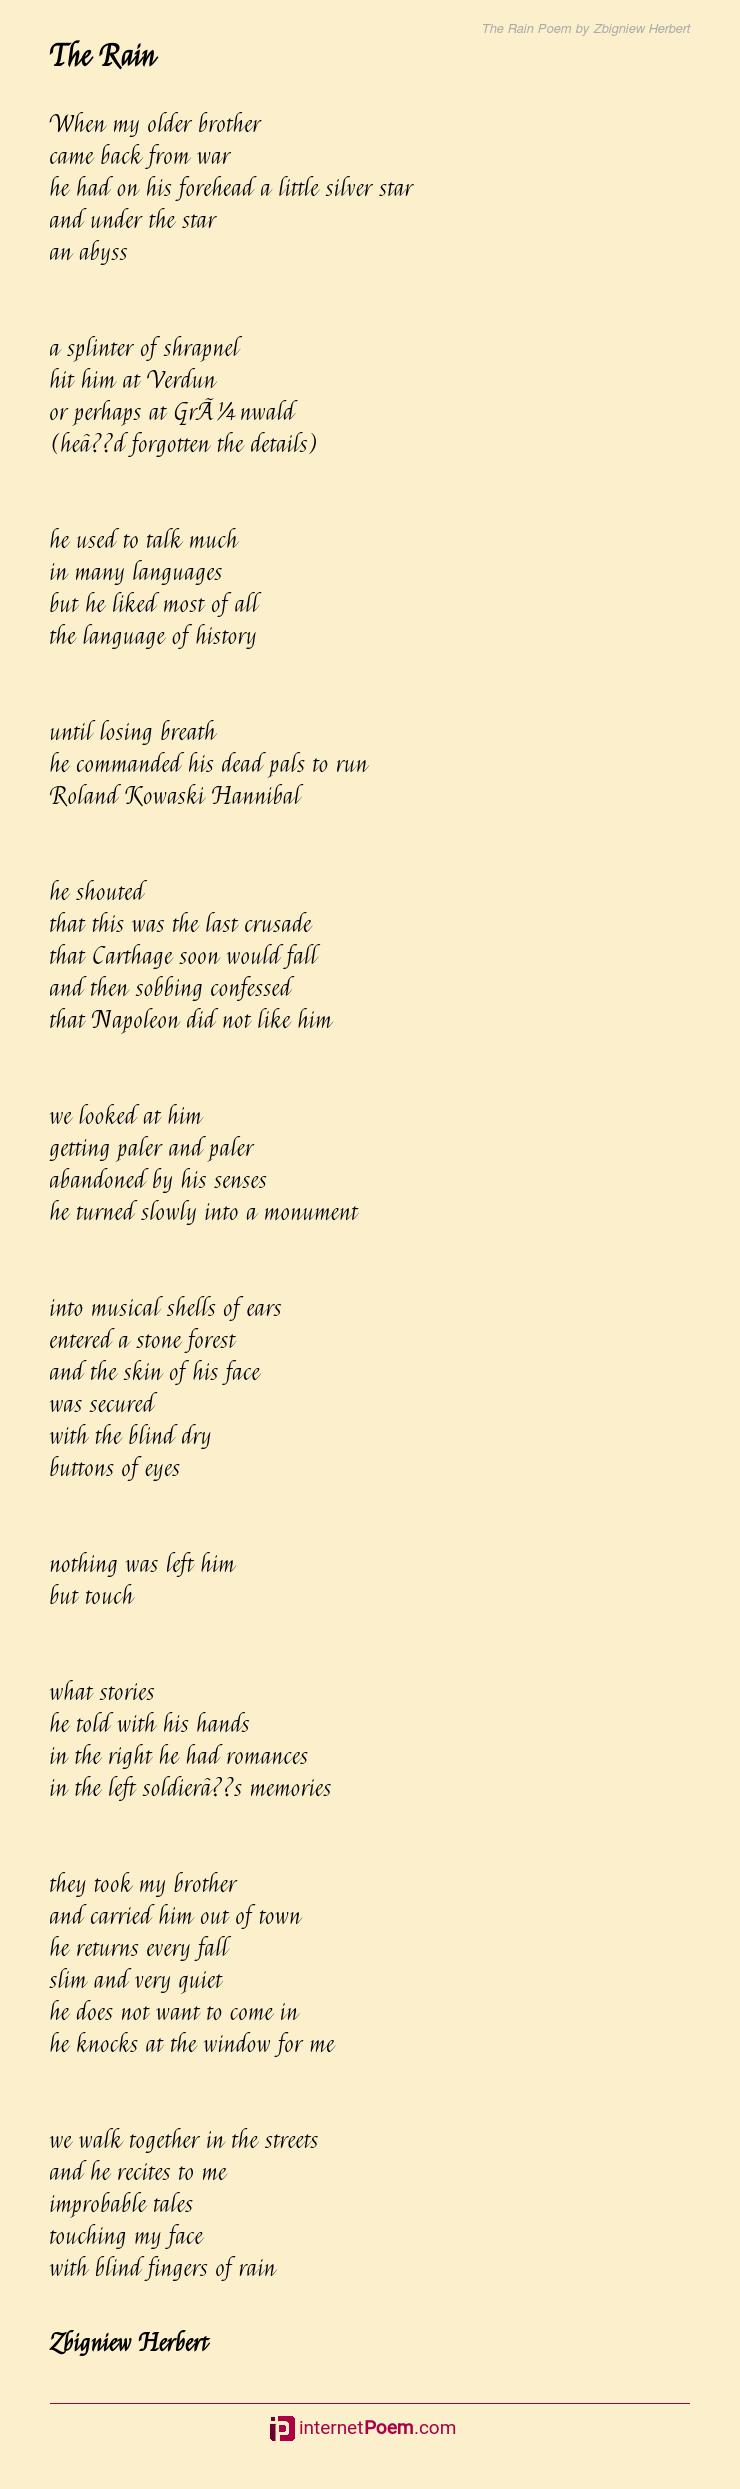 The Rain Poem By Zbigniew Herbert